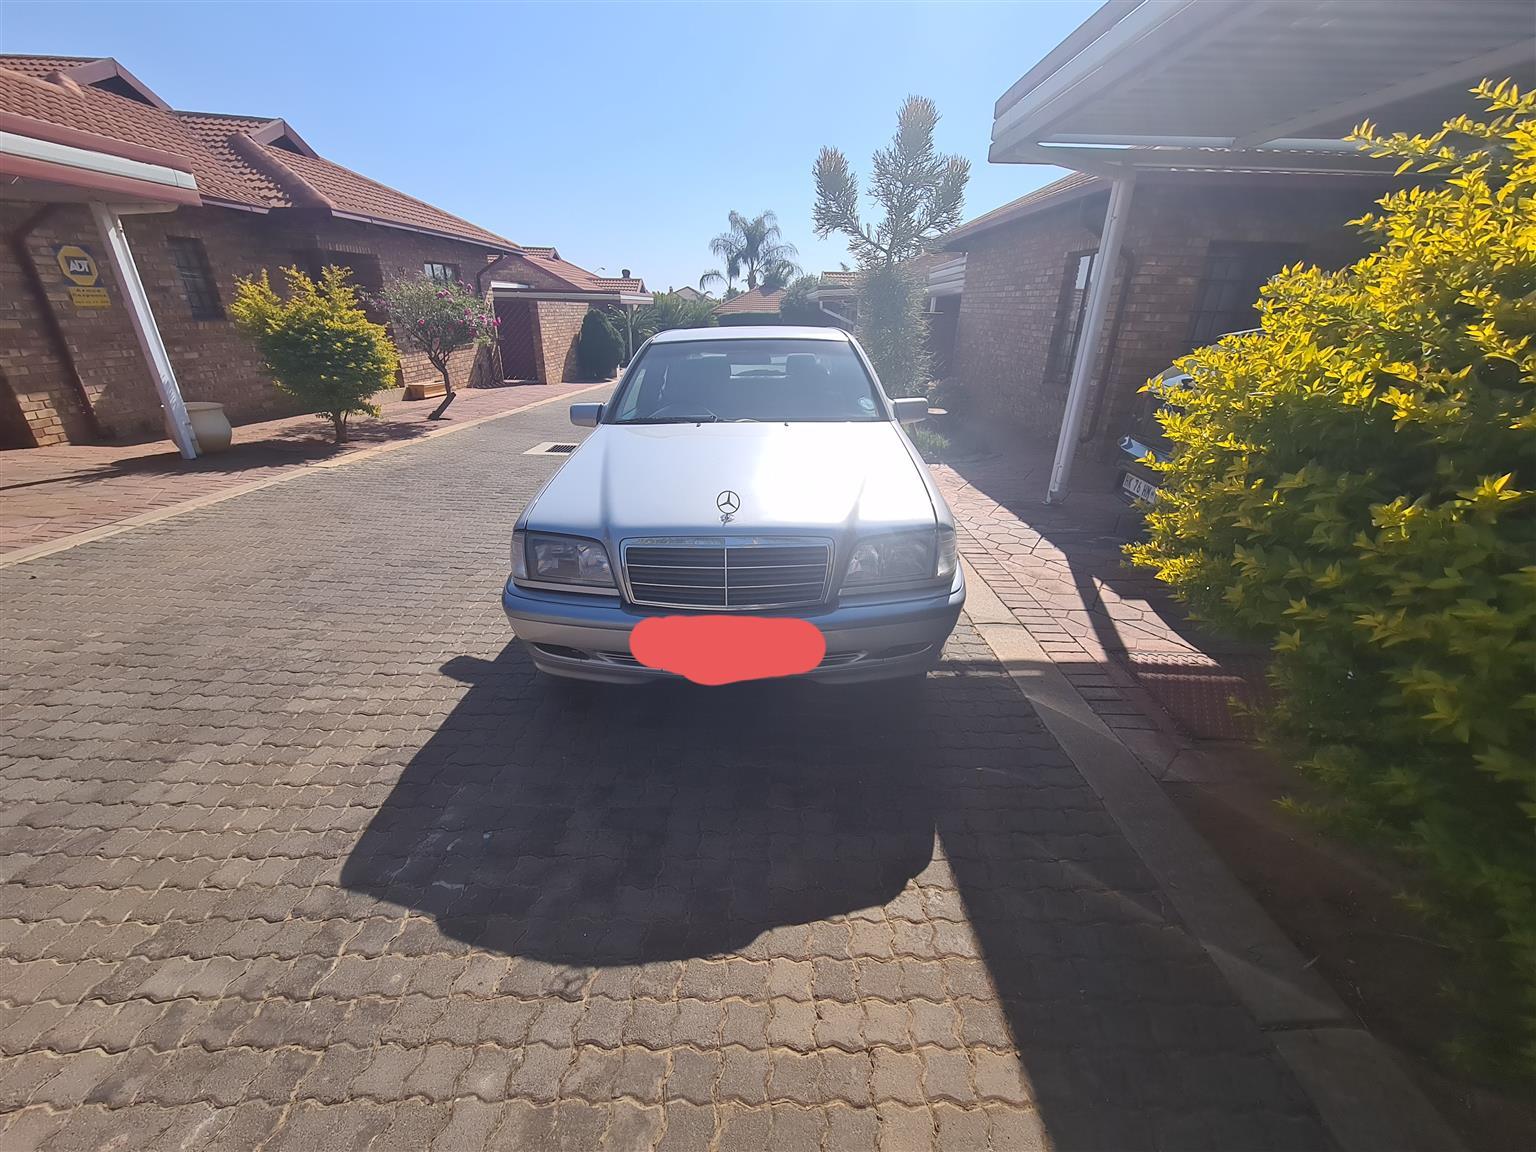 1998 Mercedes Benz C-Class C200 Edition C